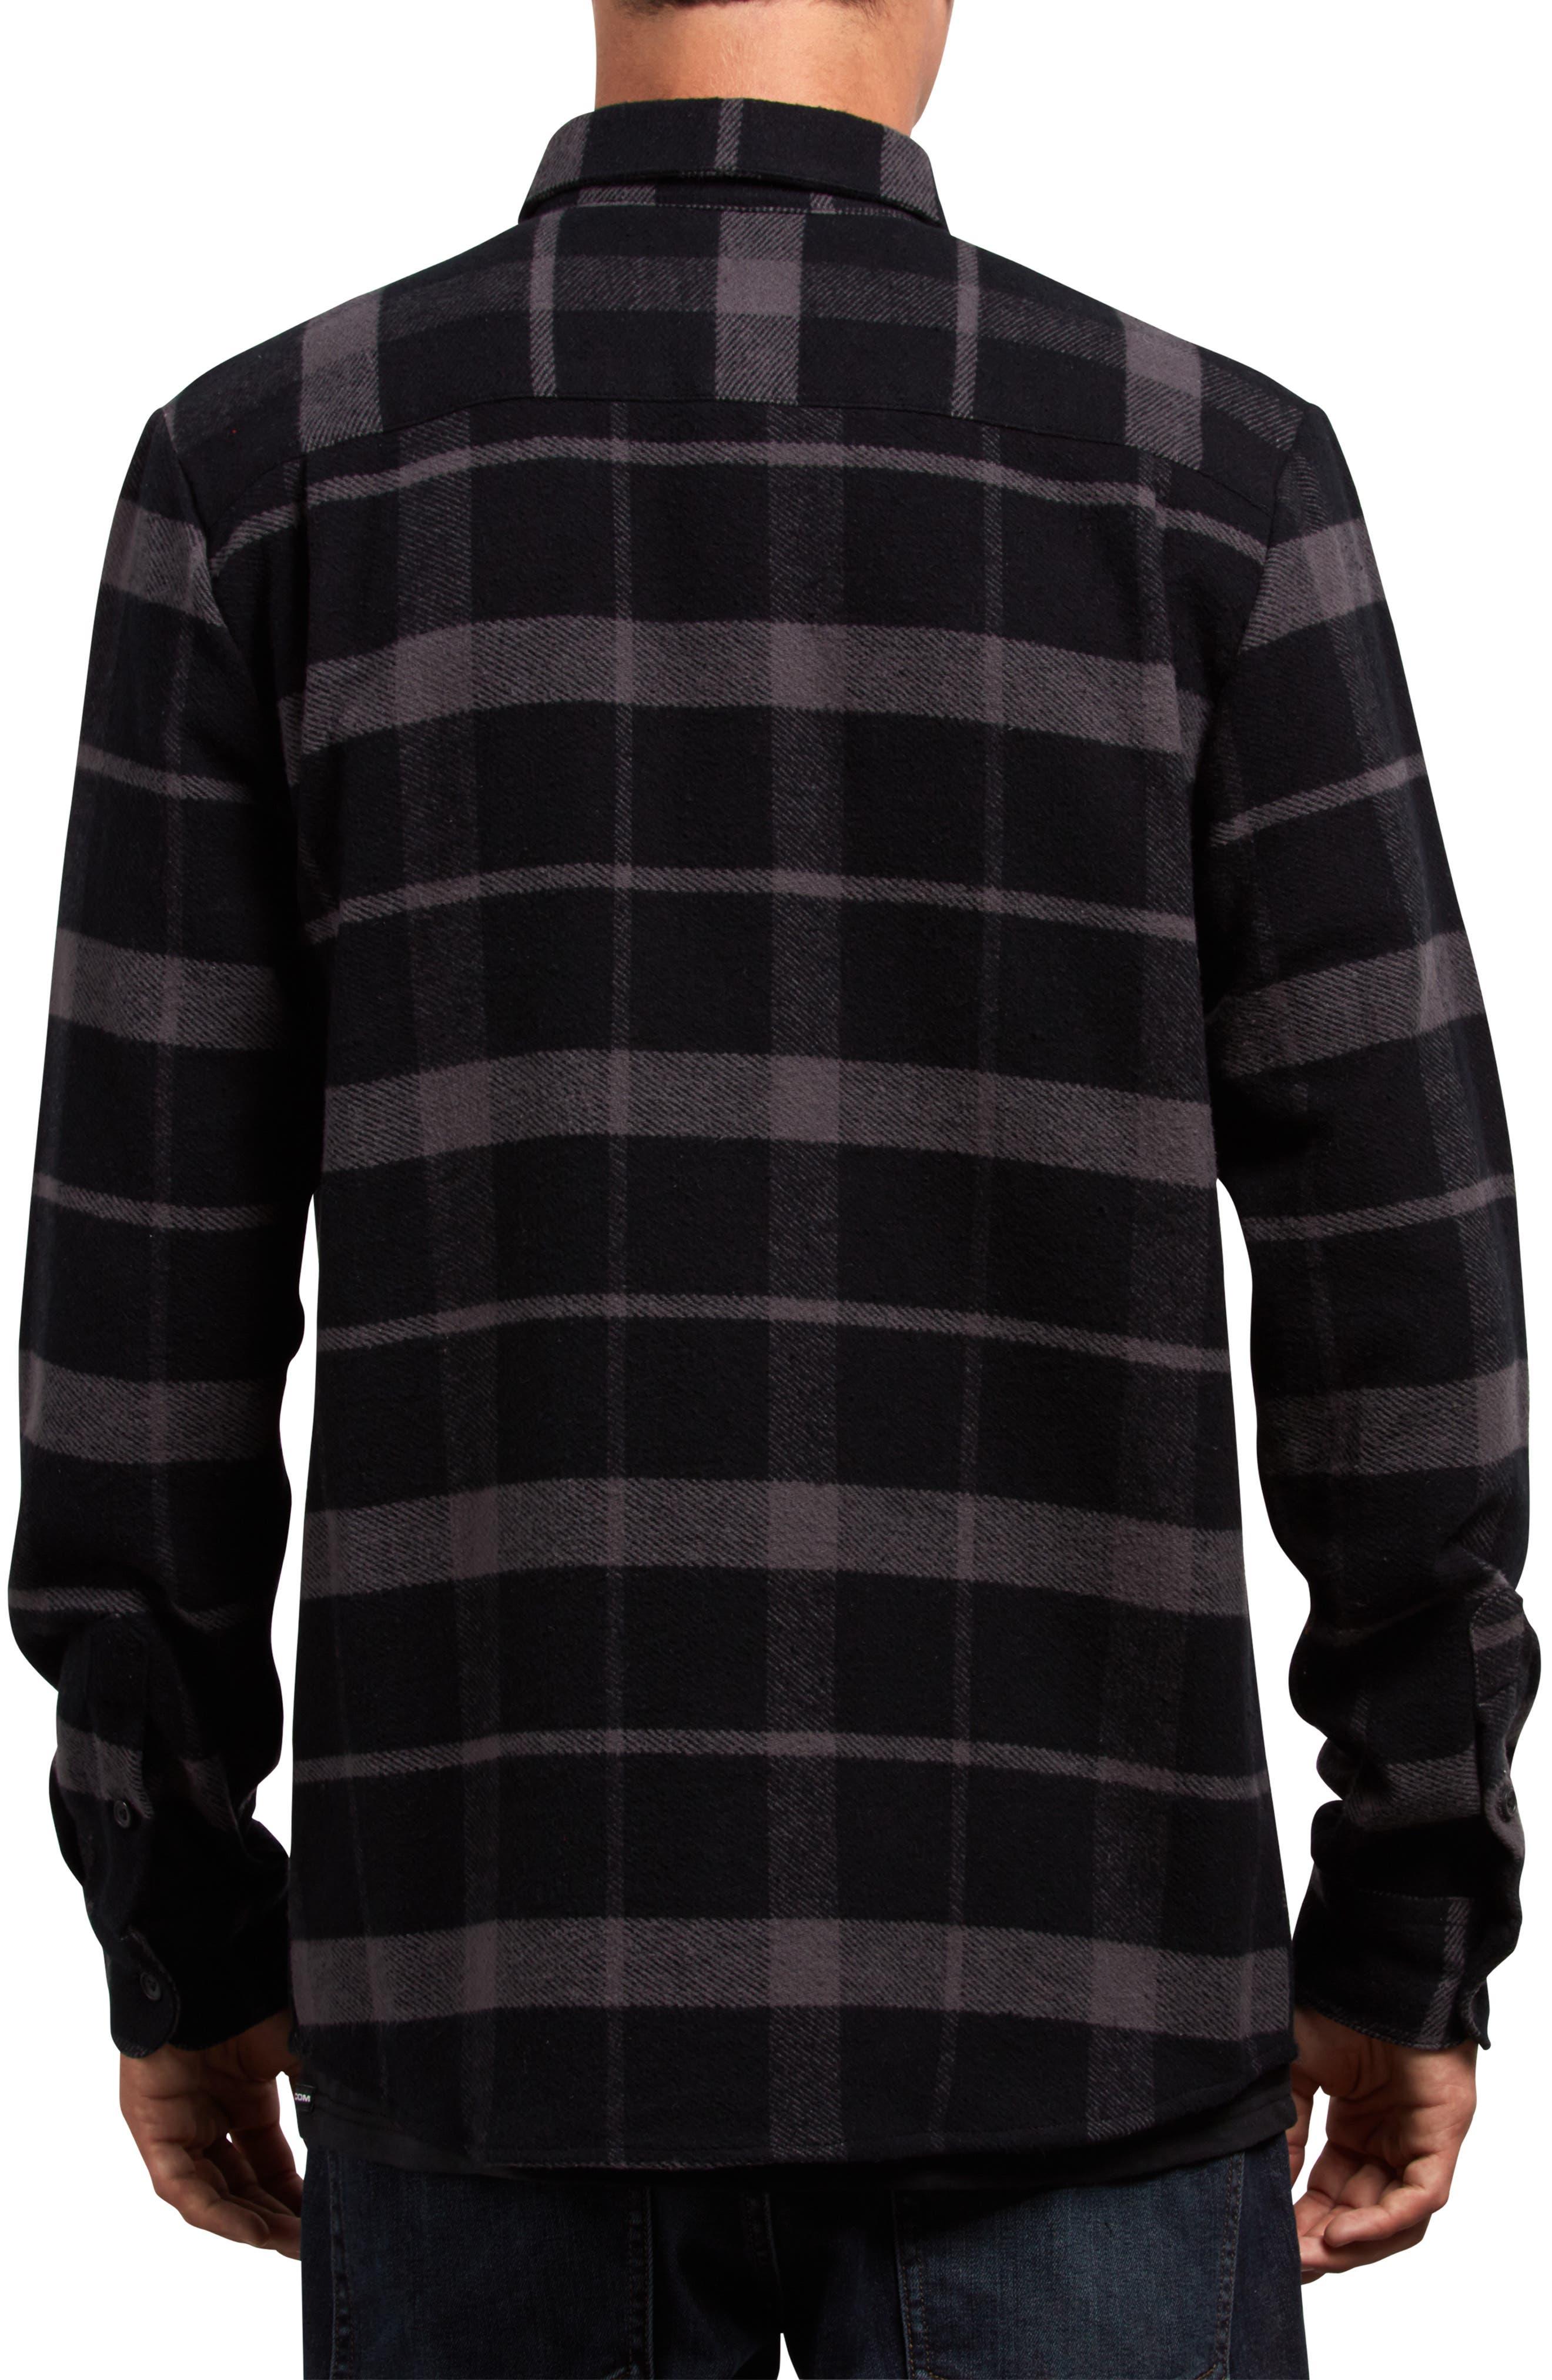 Shader Flannel Shirt,                             Alternate thumbnail 2, color,                             001